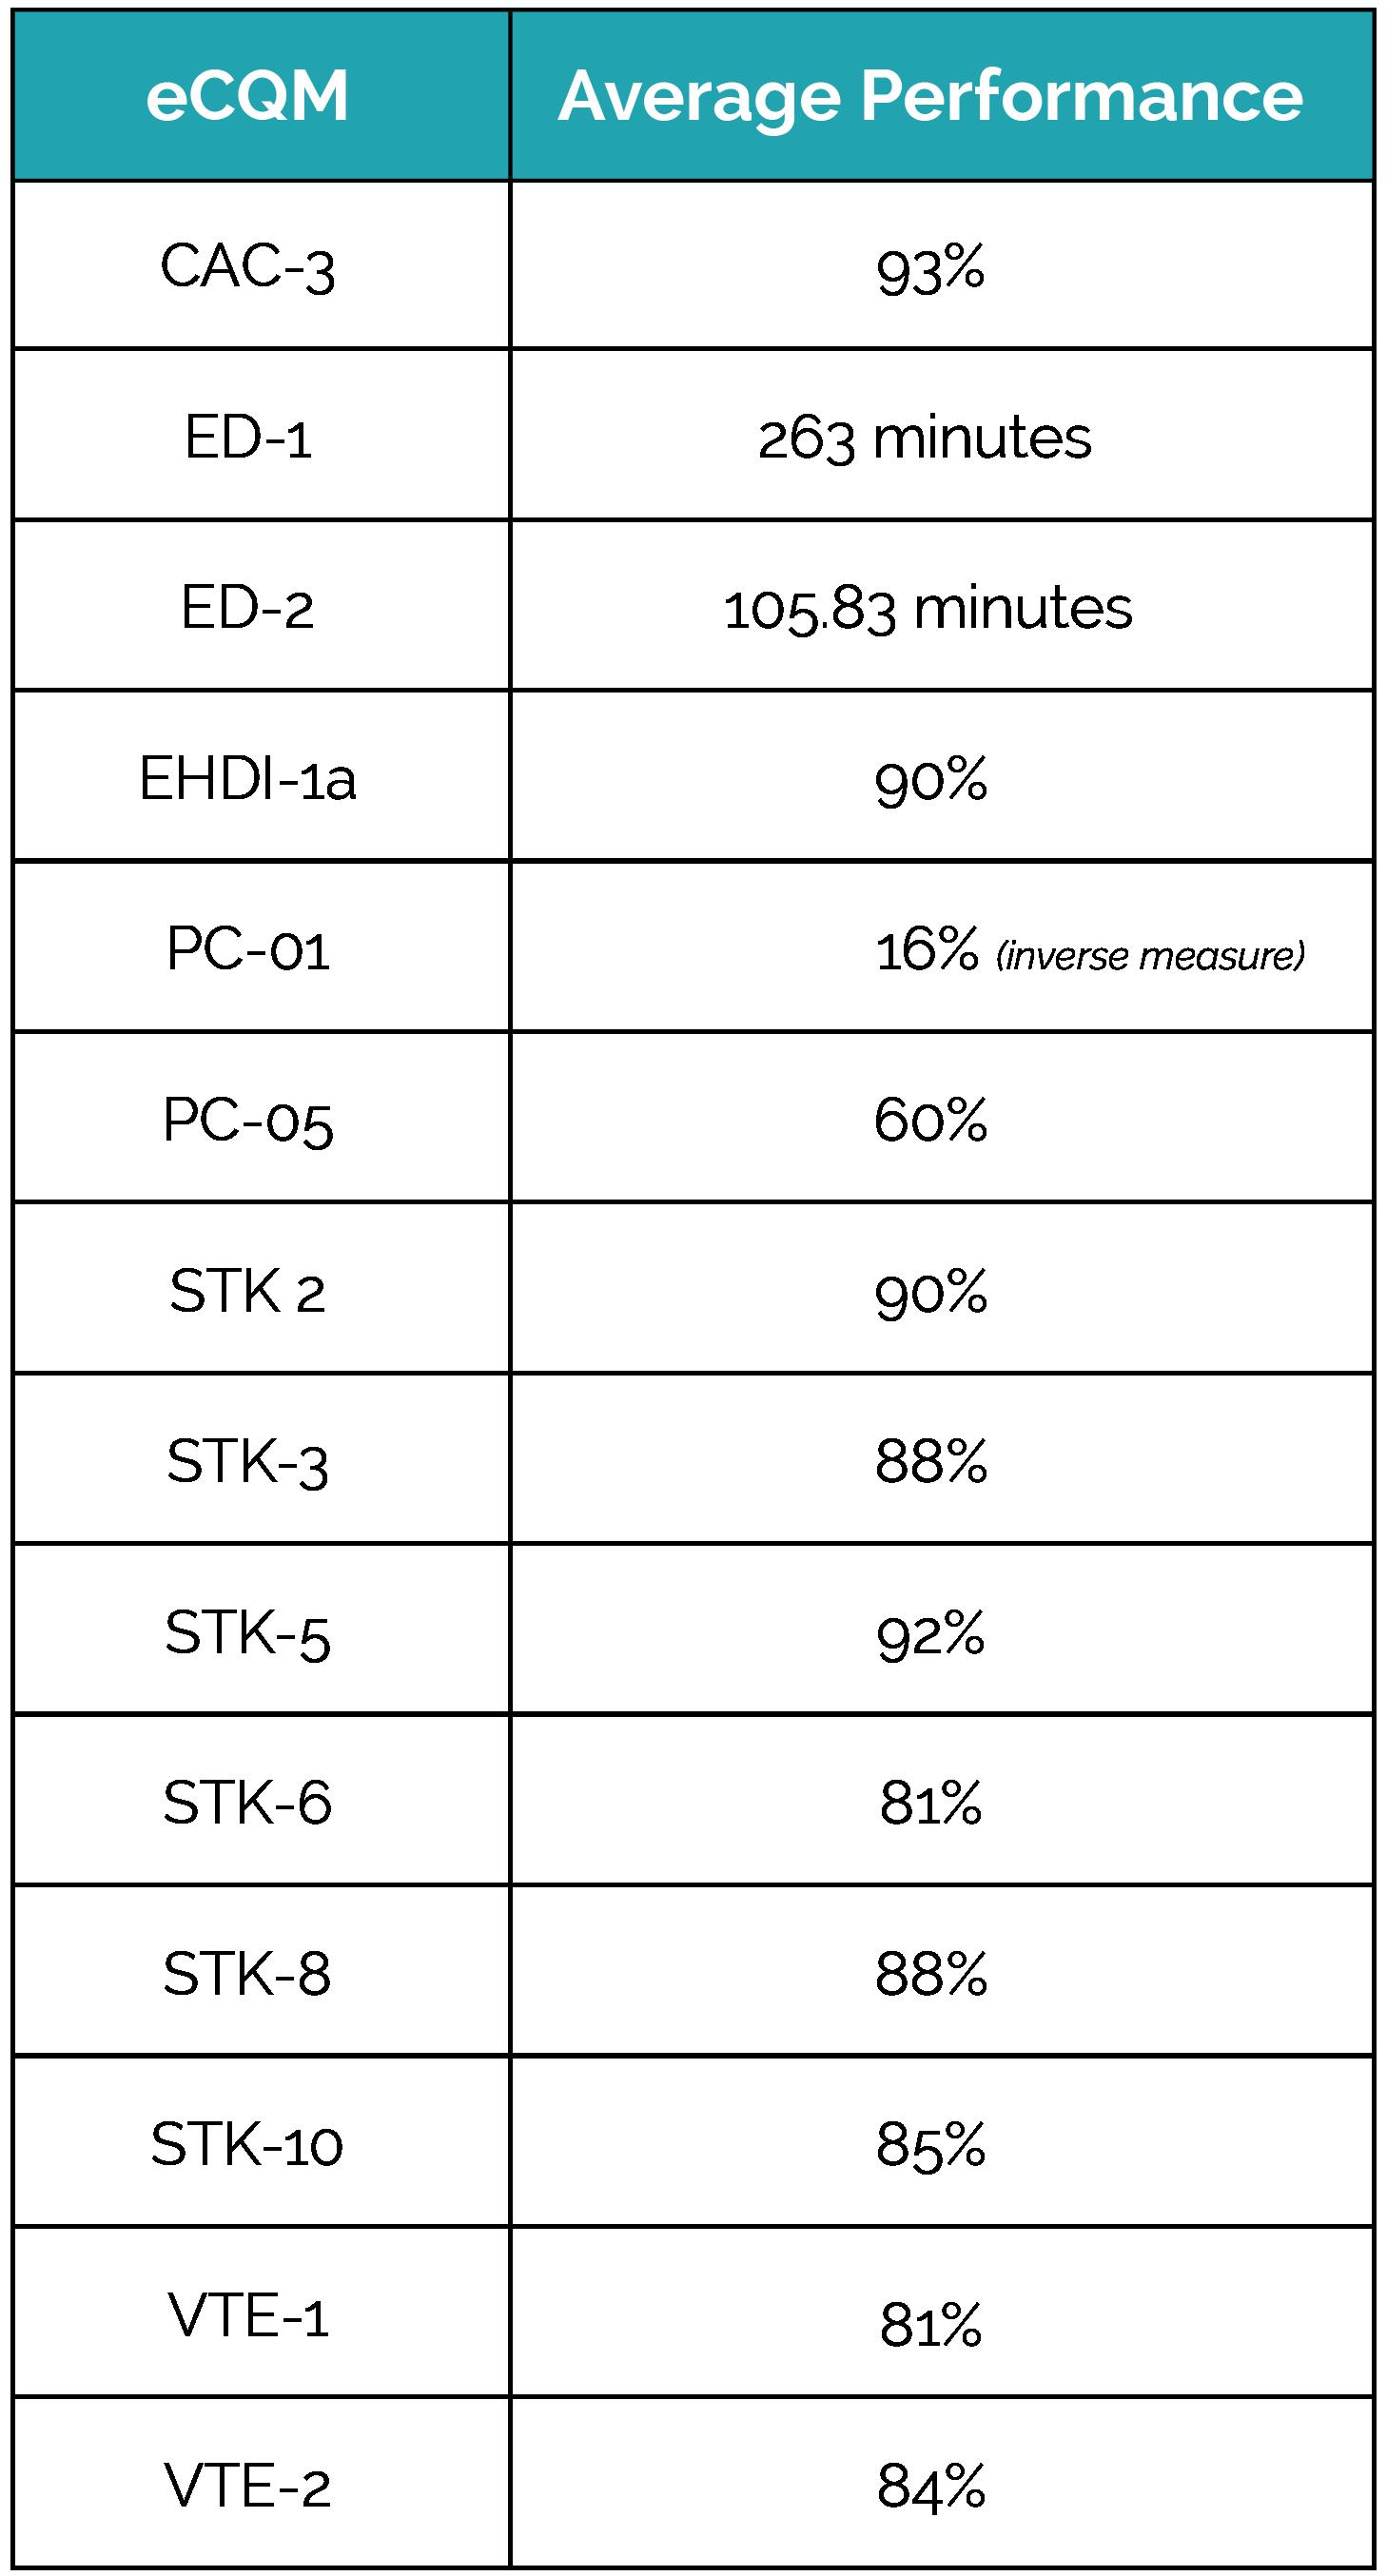 ecqm-compare-graph-1.png